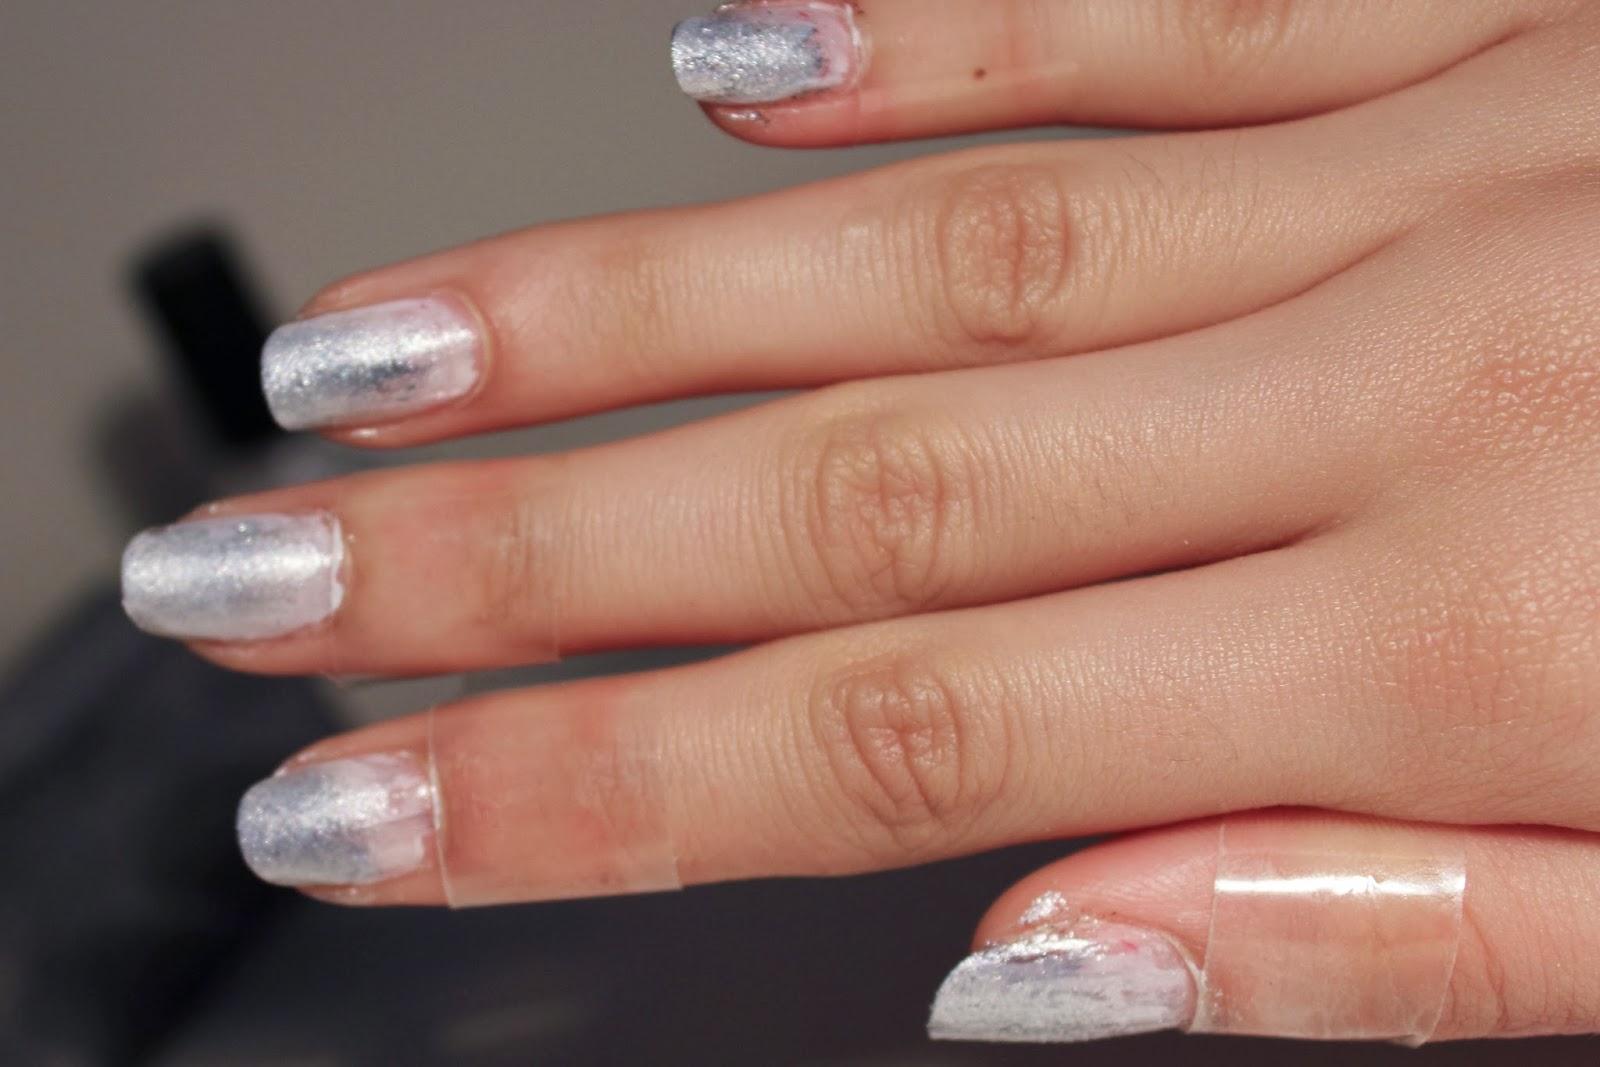 MAKARA: Zombie Nails for Halloween